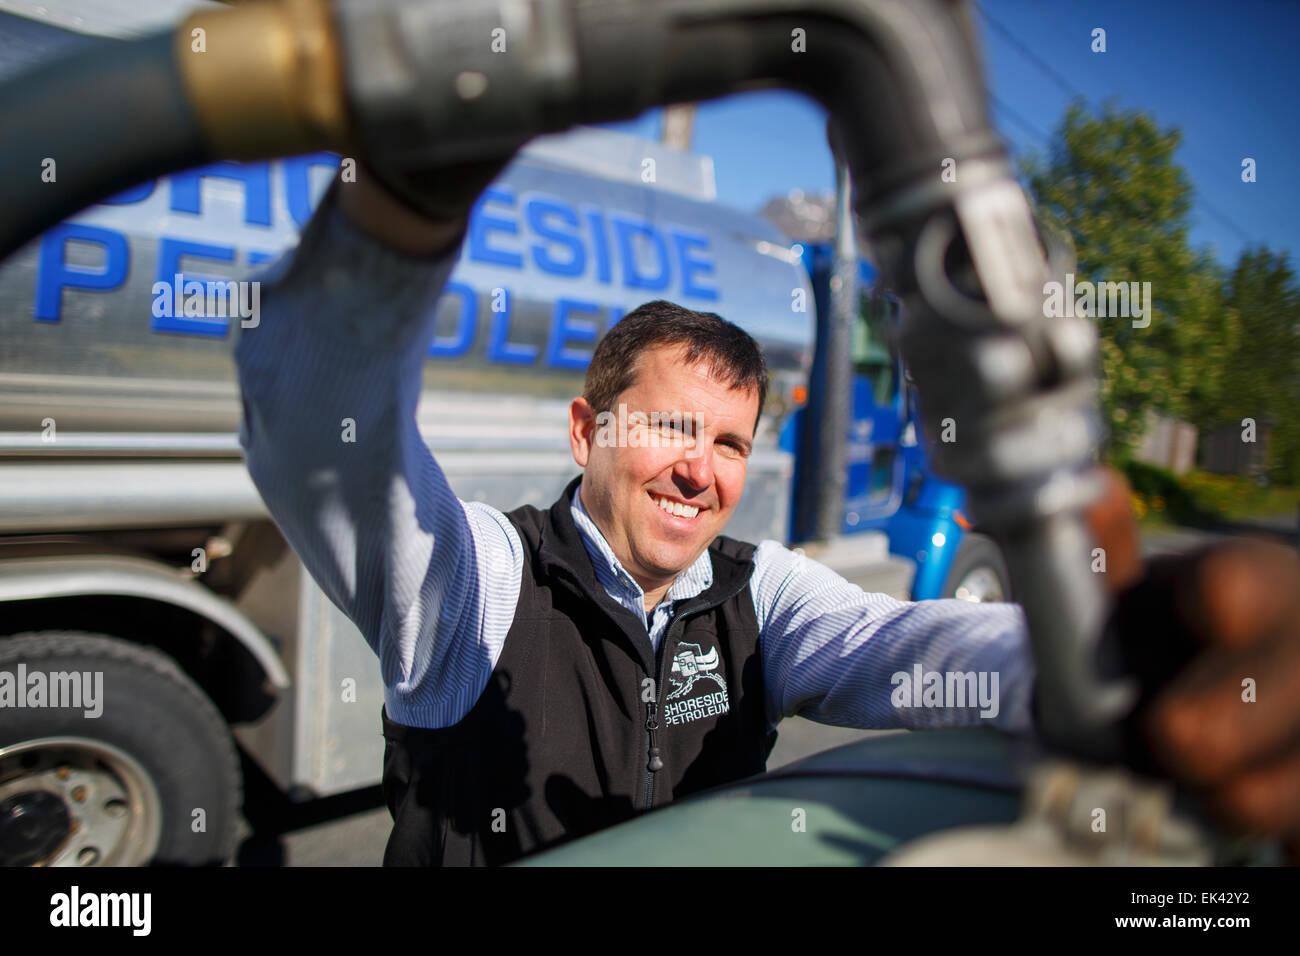 Fuel delivery, Seward, Alaska, - Stock Image